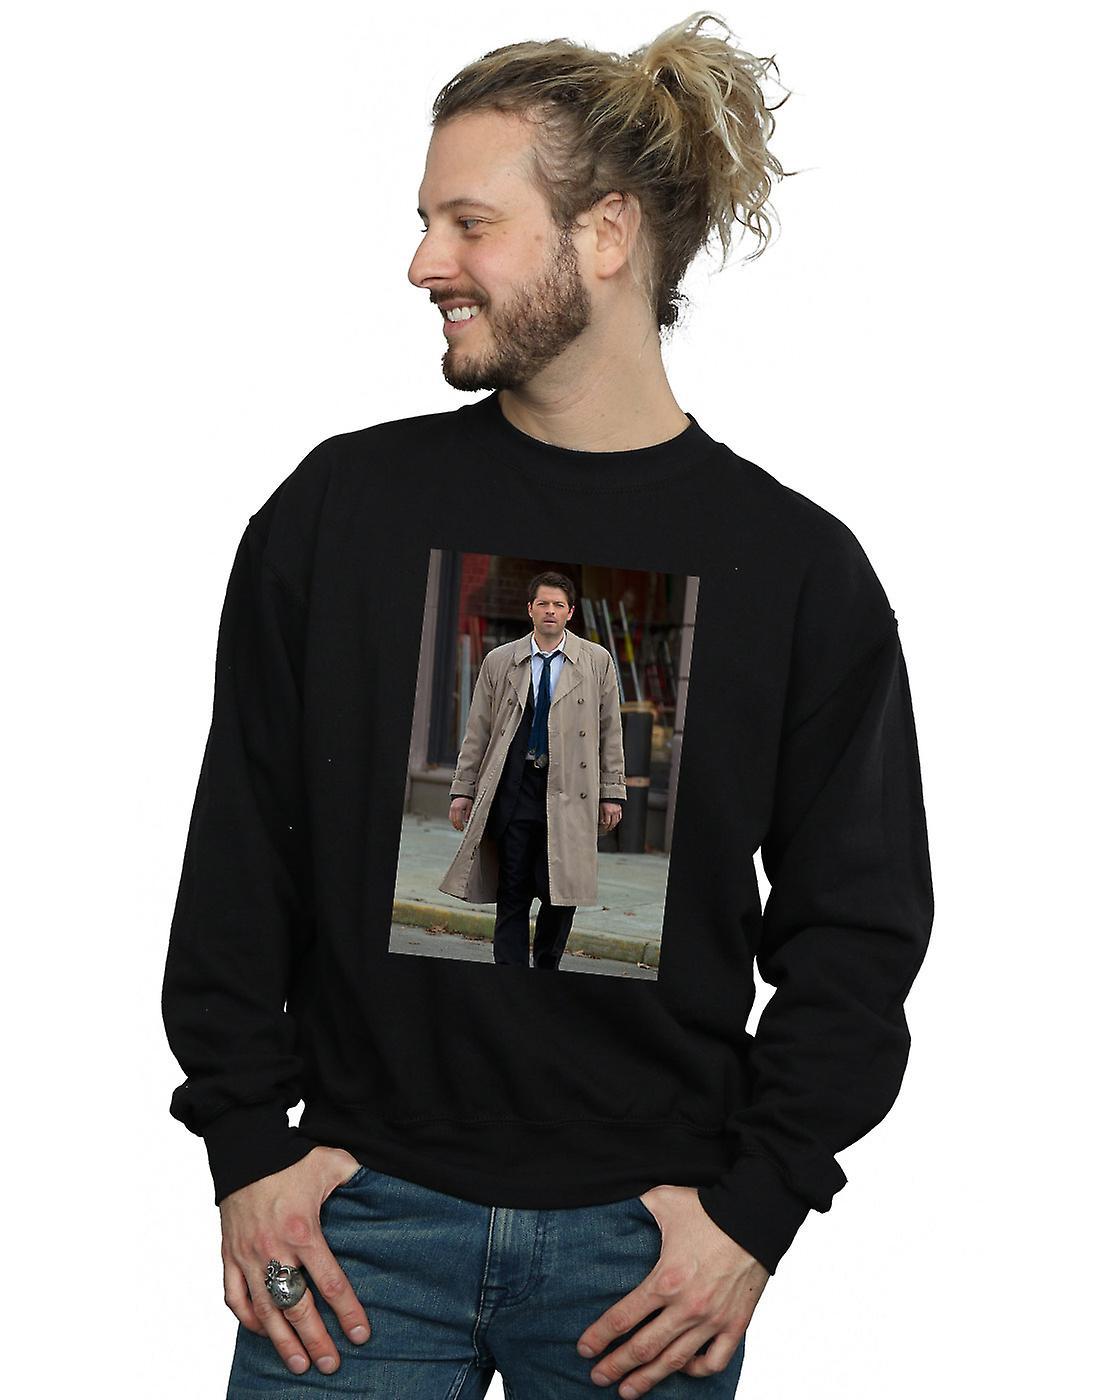 Supernatural Men's Castiel Photograph Sweatshirt